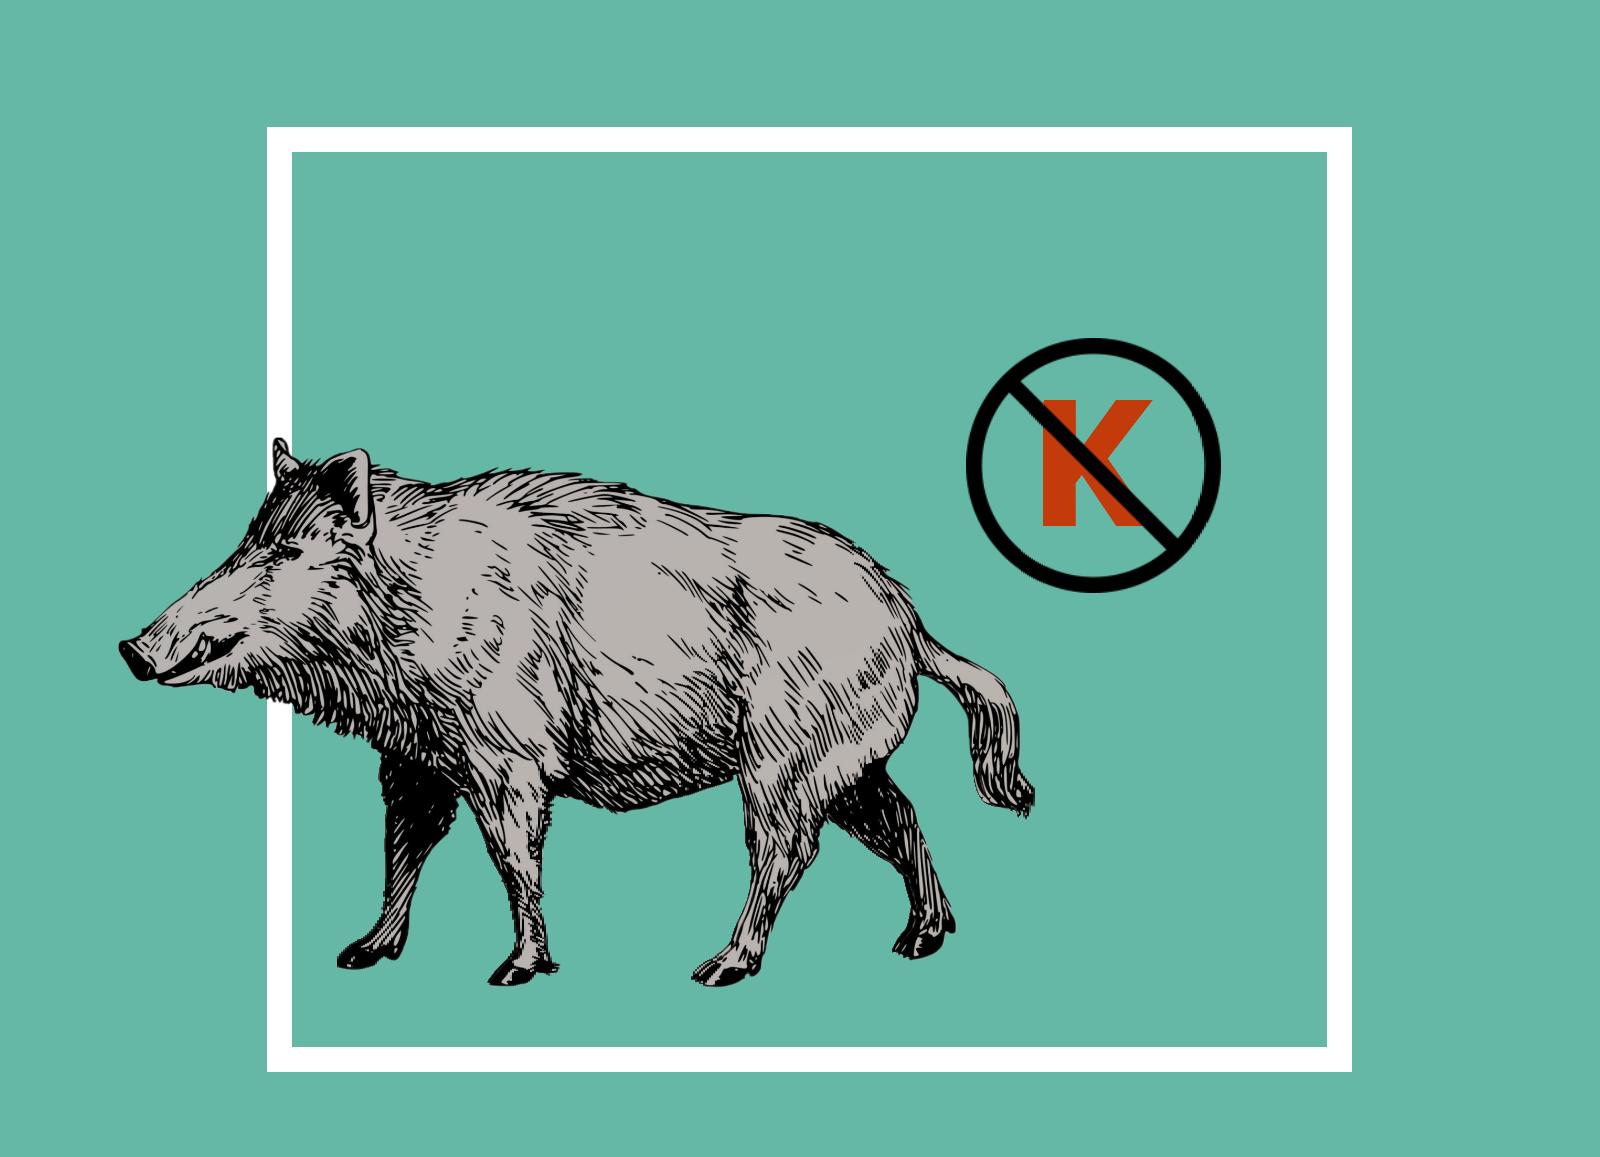 не ведите себя по-свински